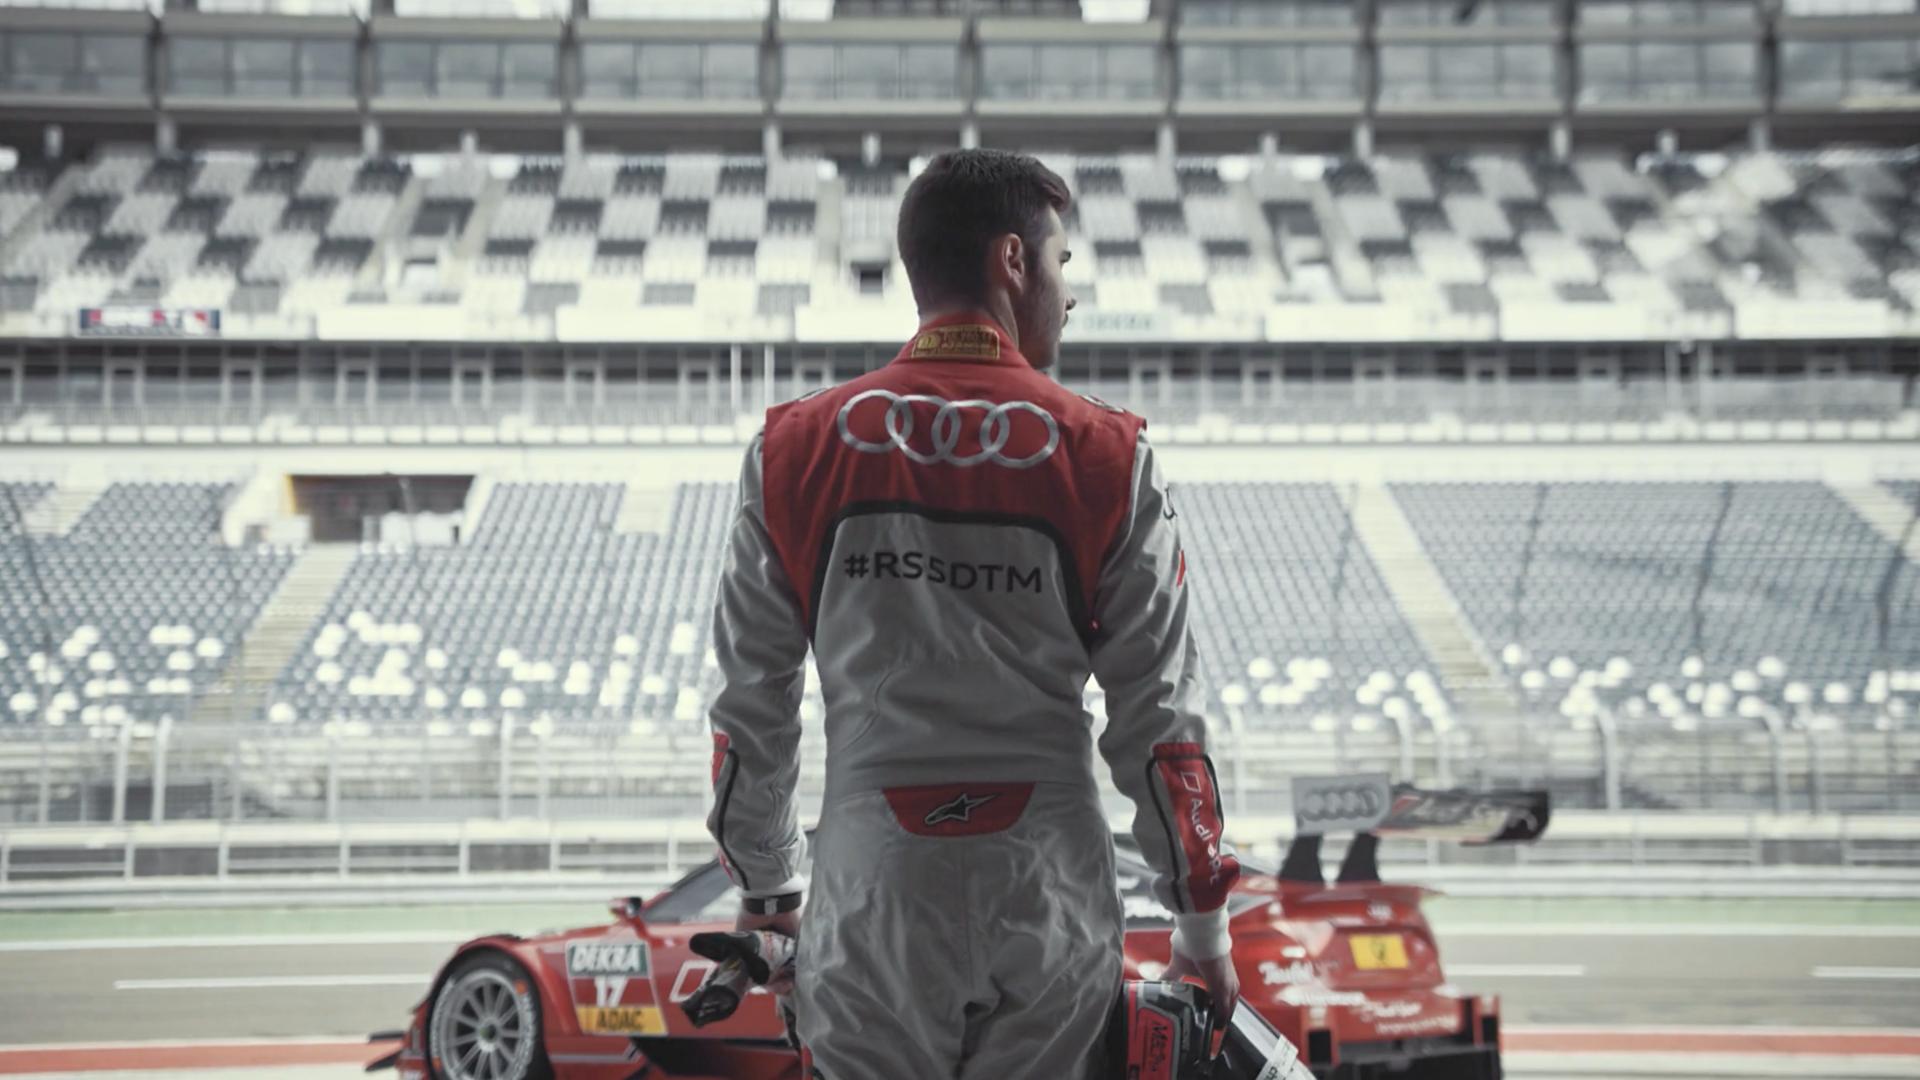 Teufel X Audi #raceheart